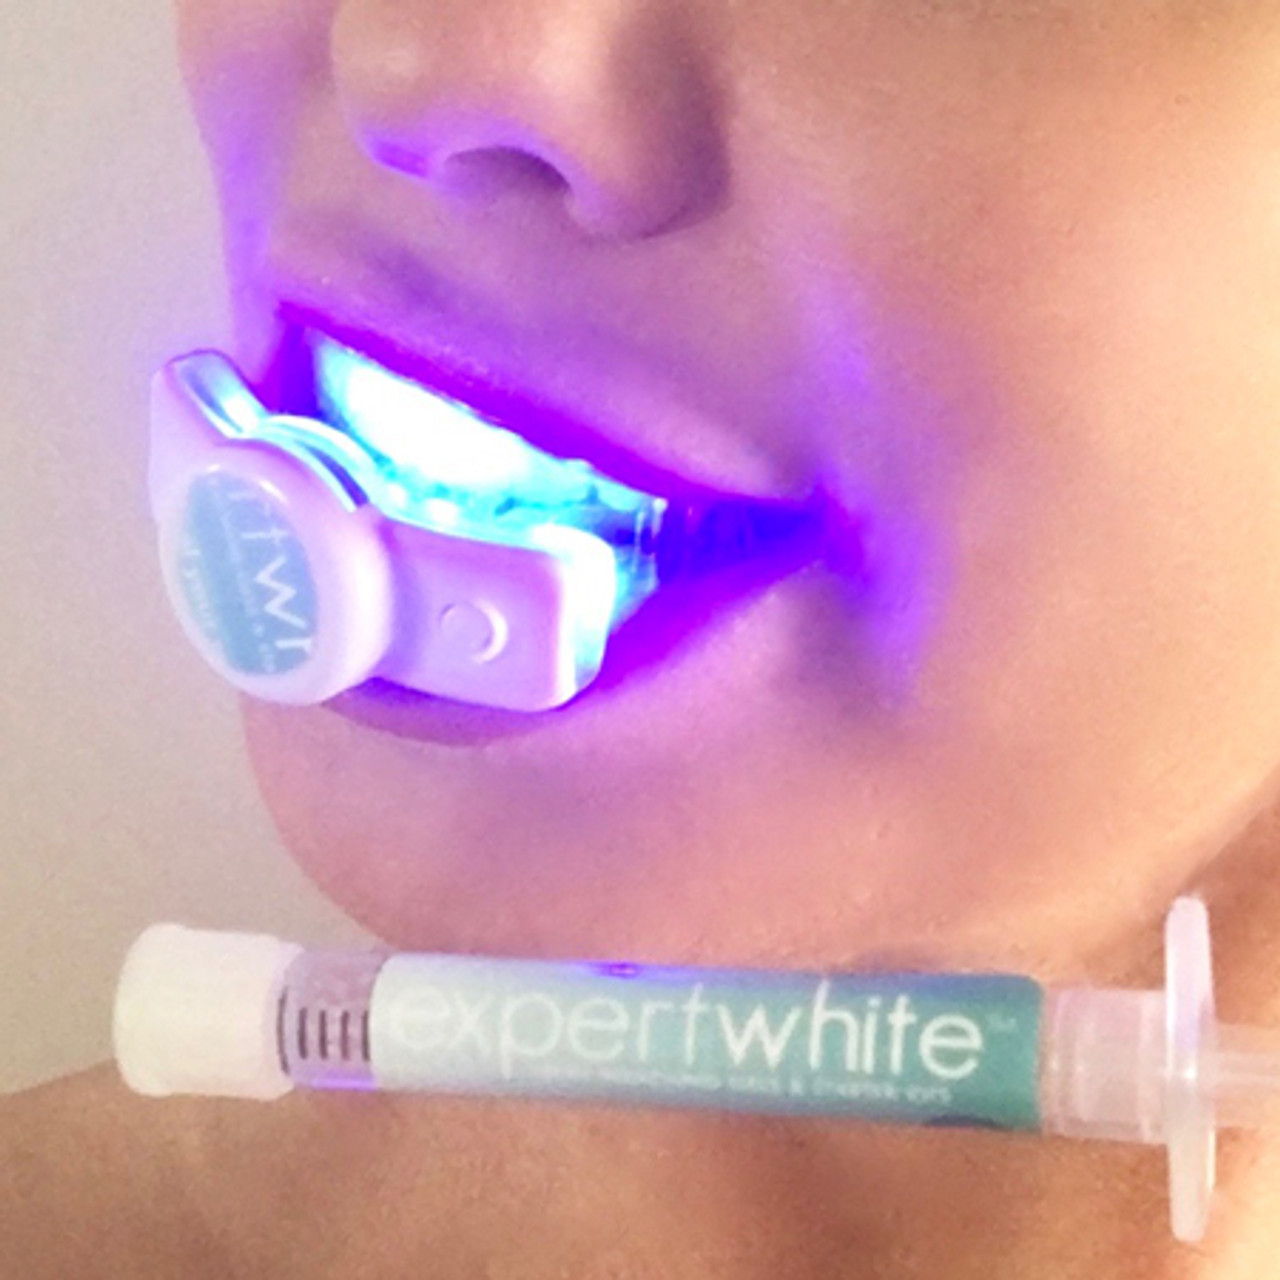 Teeth Whitening Kit Led Light Hi Smile